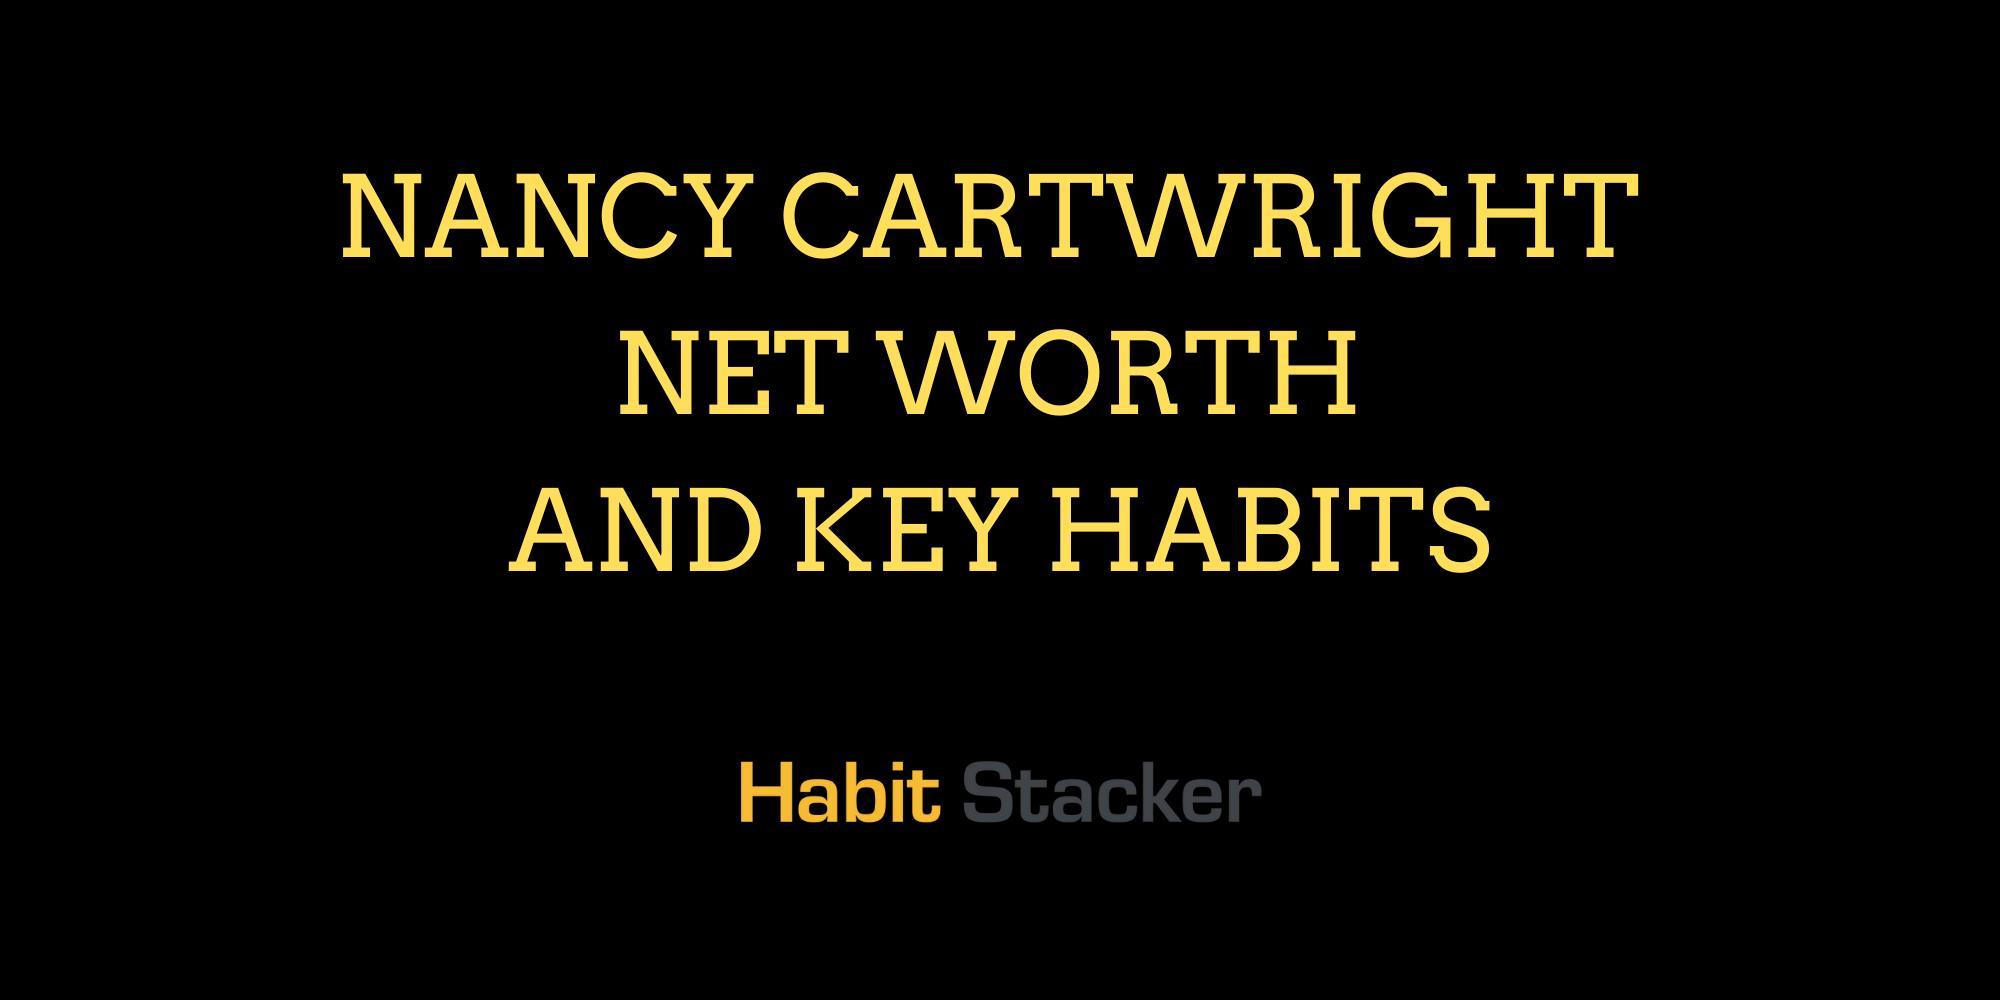 Nancy Cartwright Net Worth and Key Habits